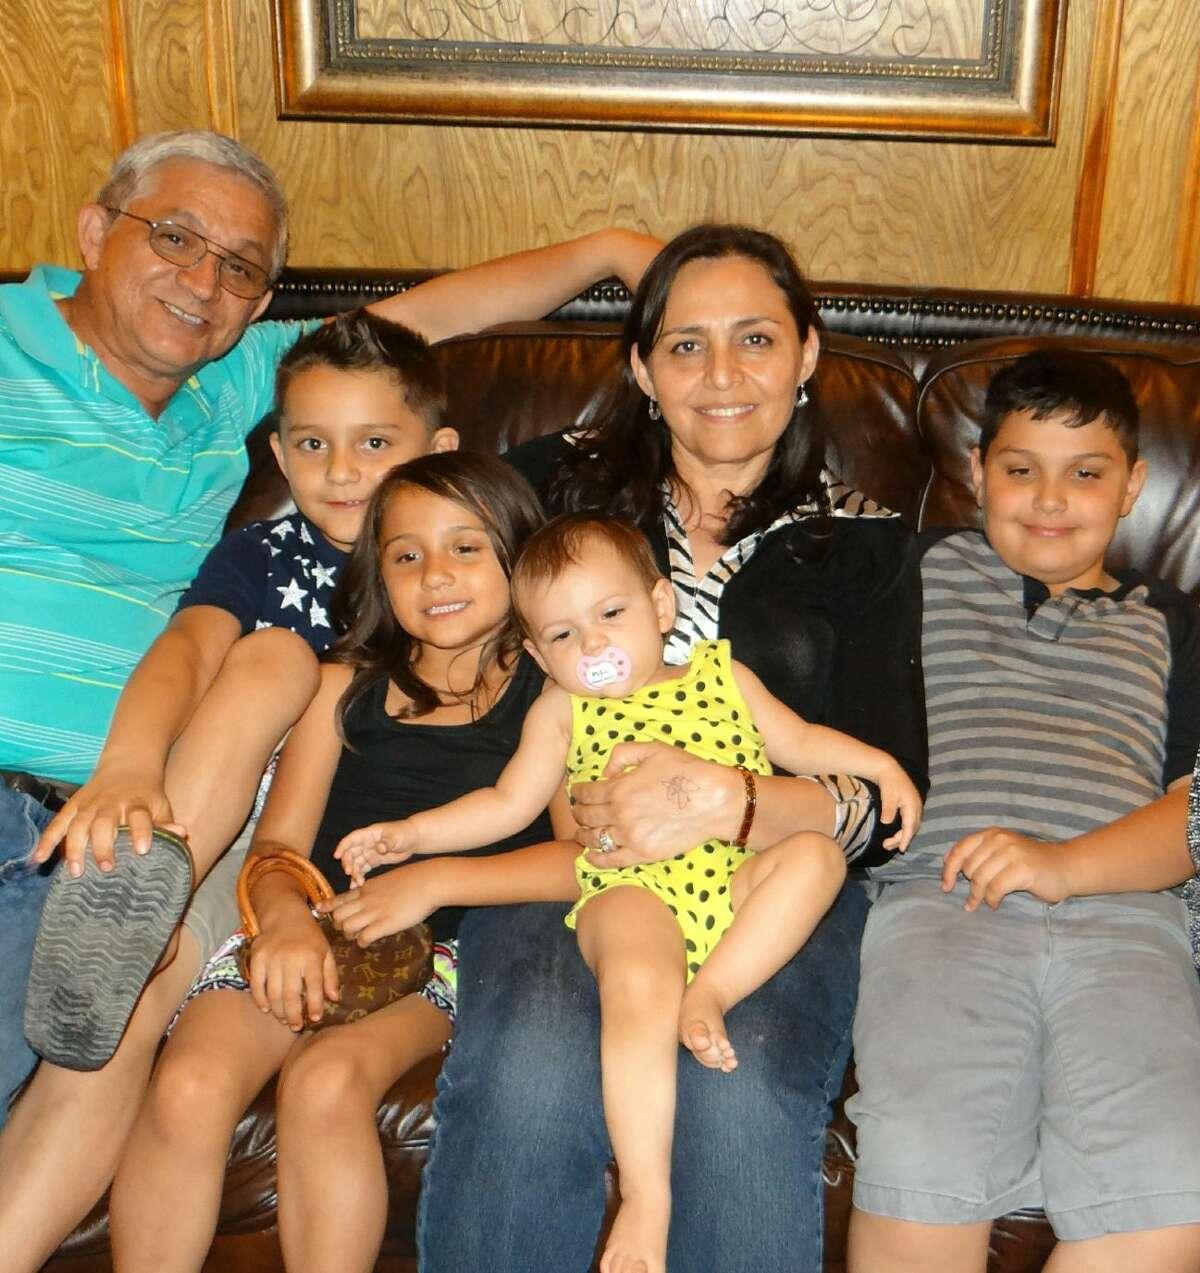 Deacon Luis Mata Sr., left, and his wife, Bertha Mata, with their grandchildren, Kalvin Mata, from left, Kalissa Mata, Ellie Mata, Bertha Mata, Keaten Mata.